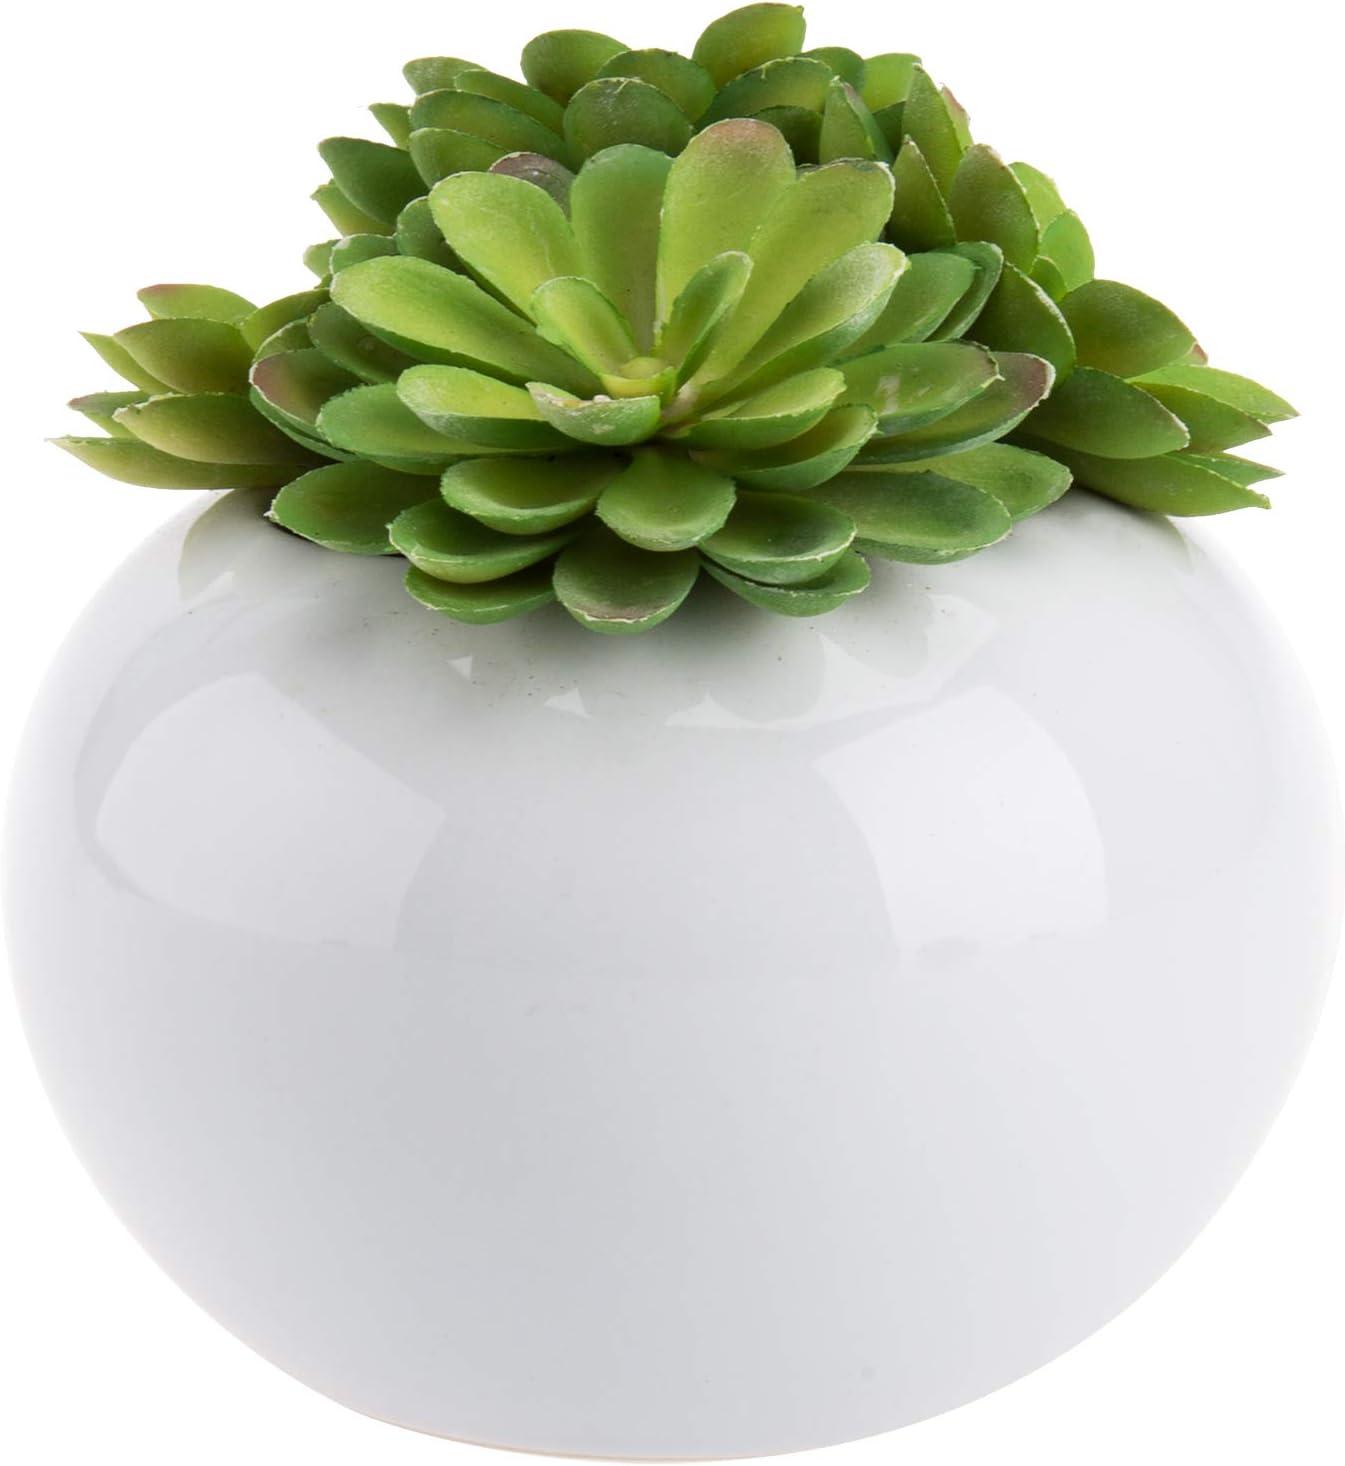 MyGift Decorative Modern Potted Green Artificial Succulent Plants w/Glazed White Ceramic Flower Pot